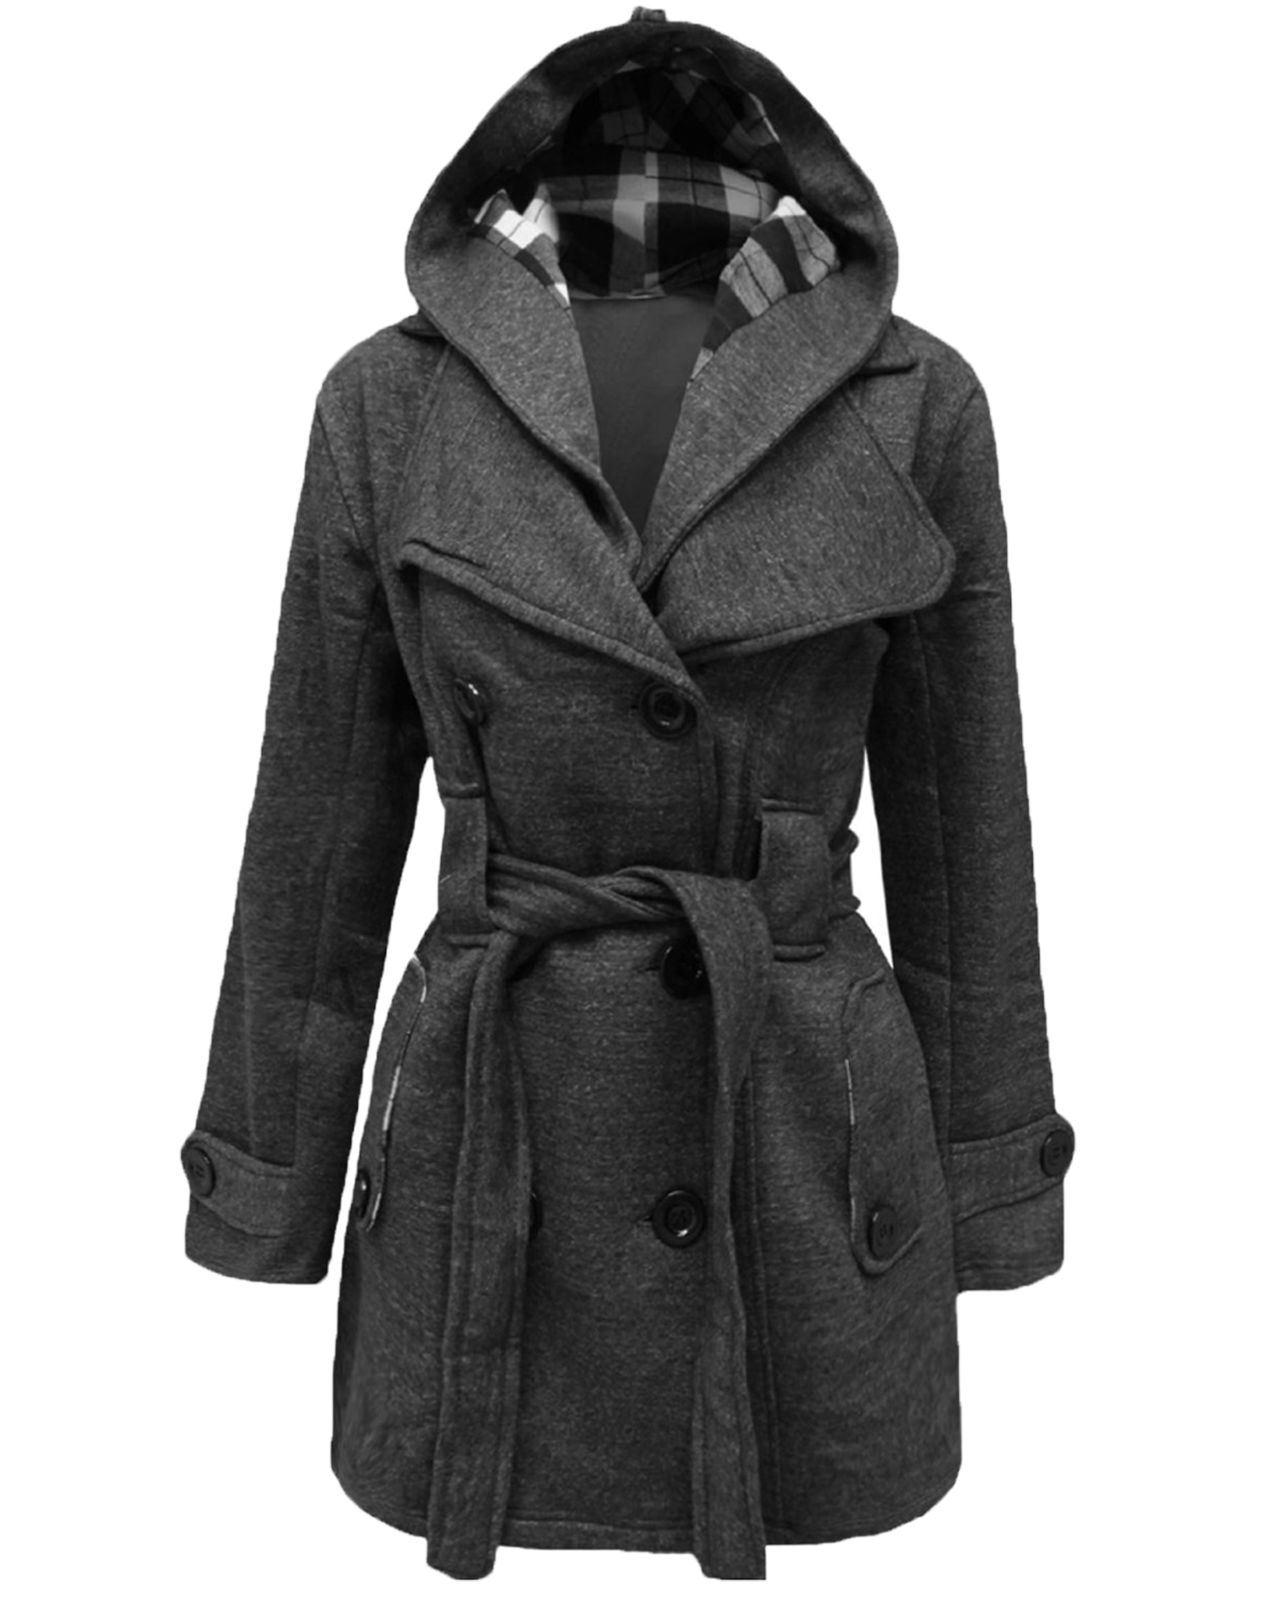 Womens waist coat